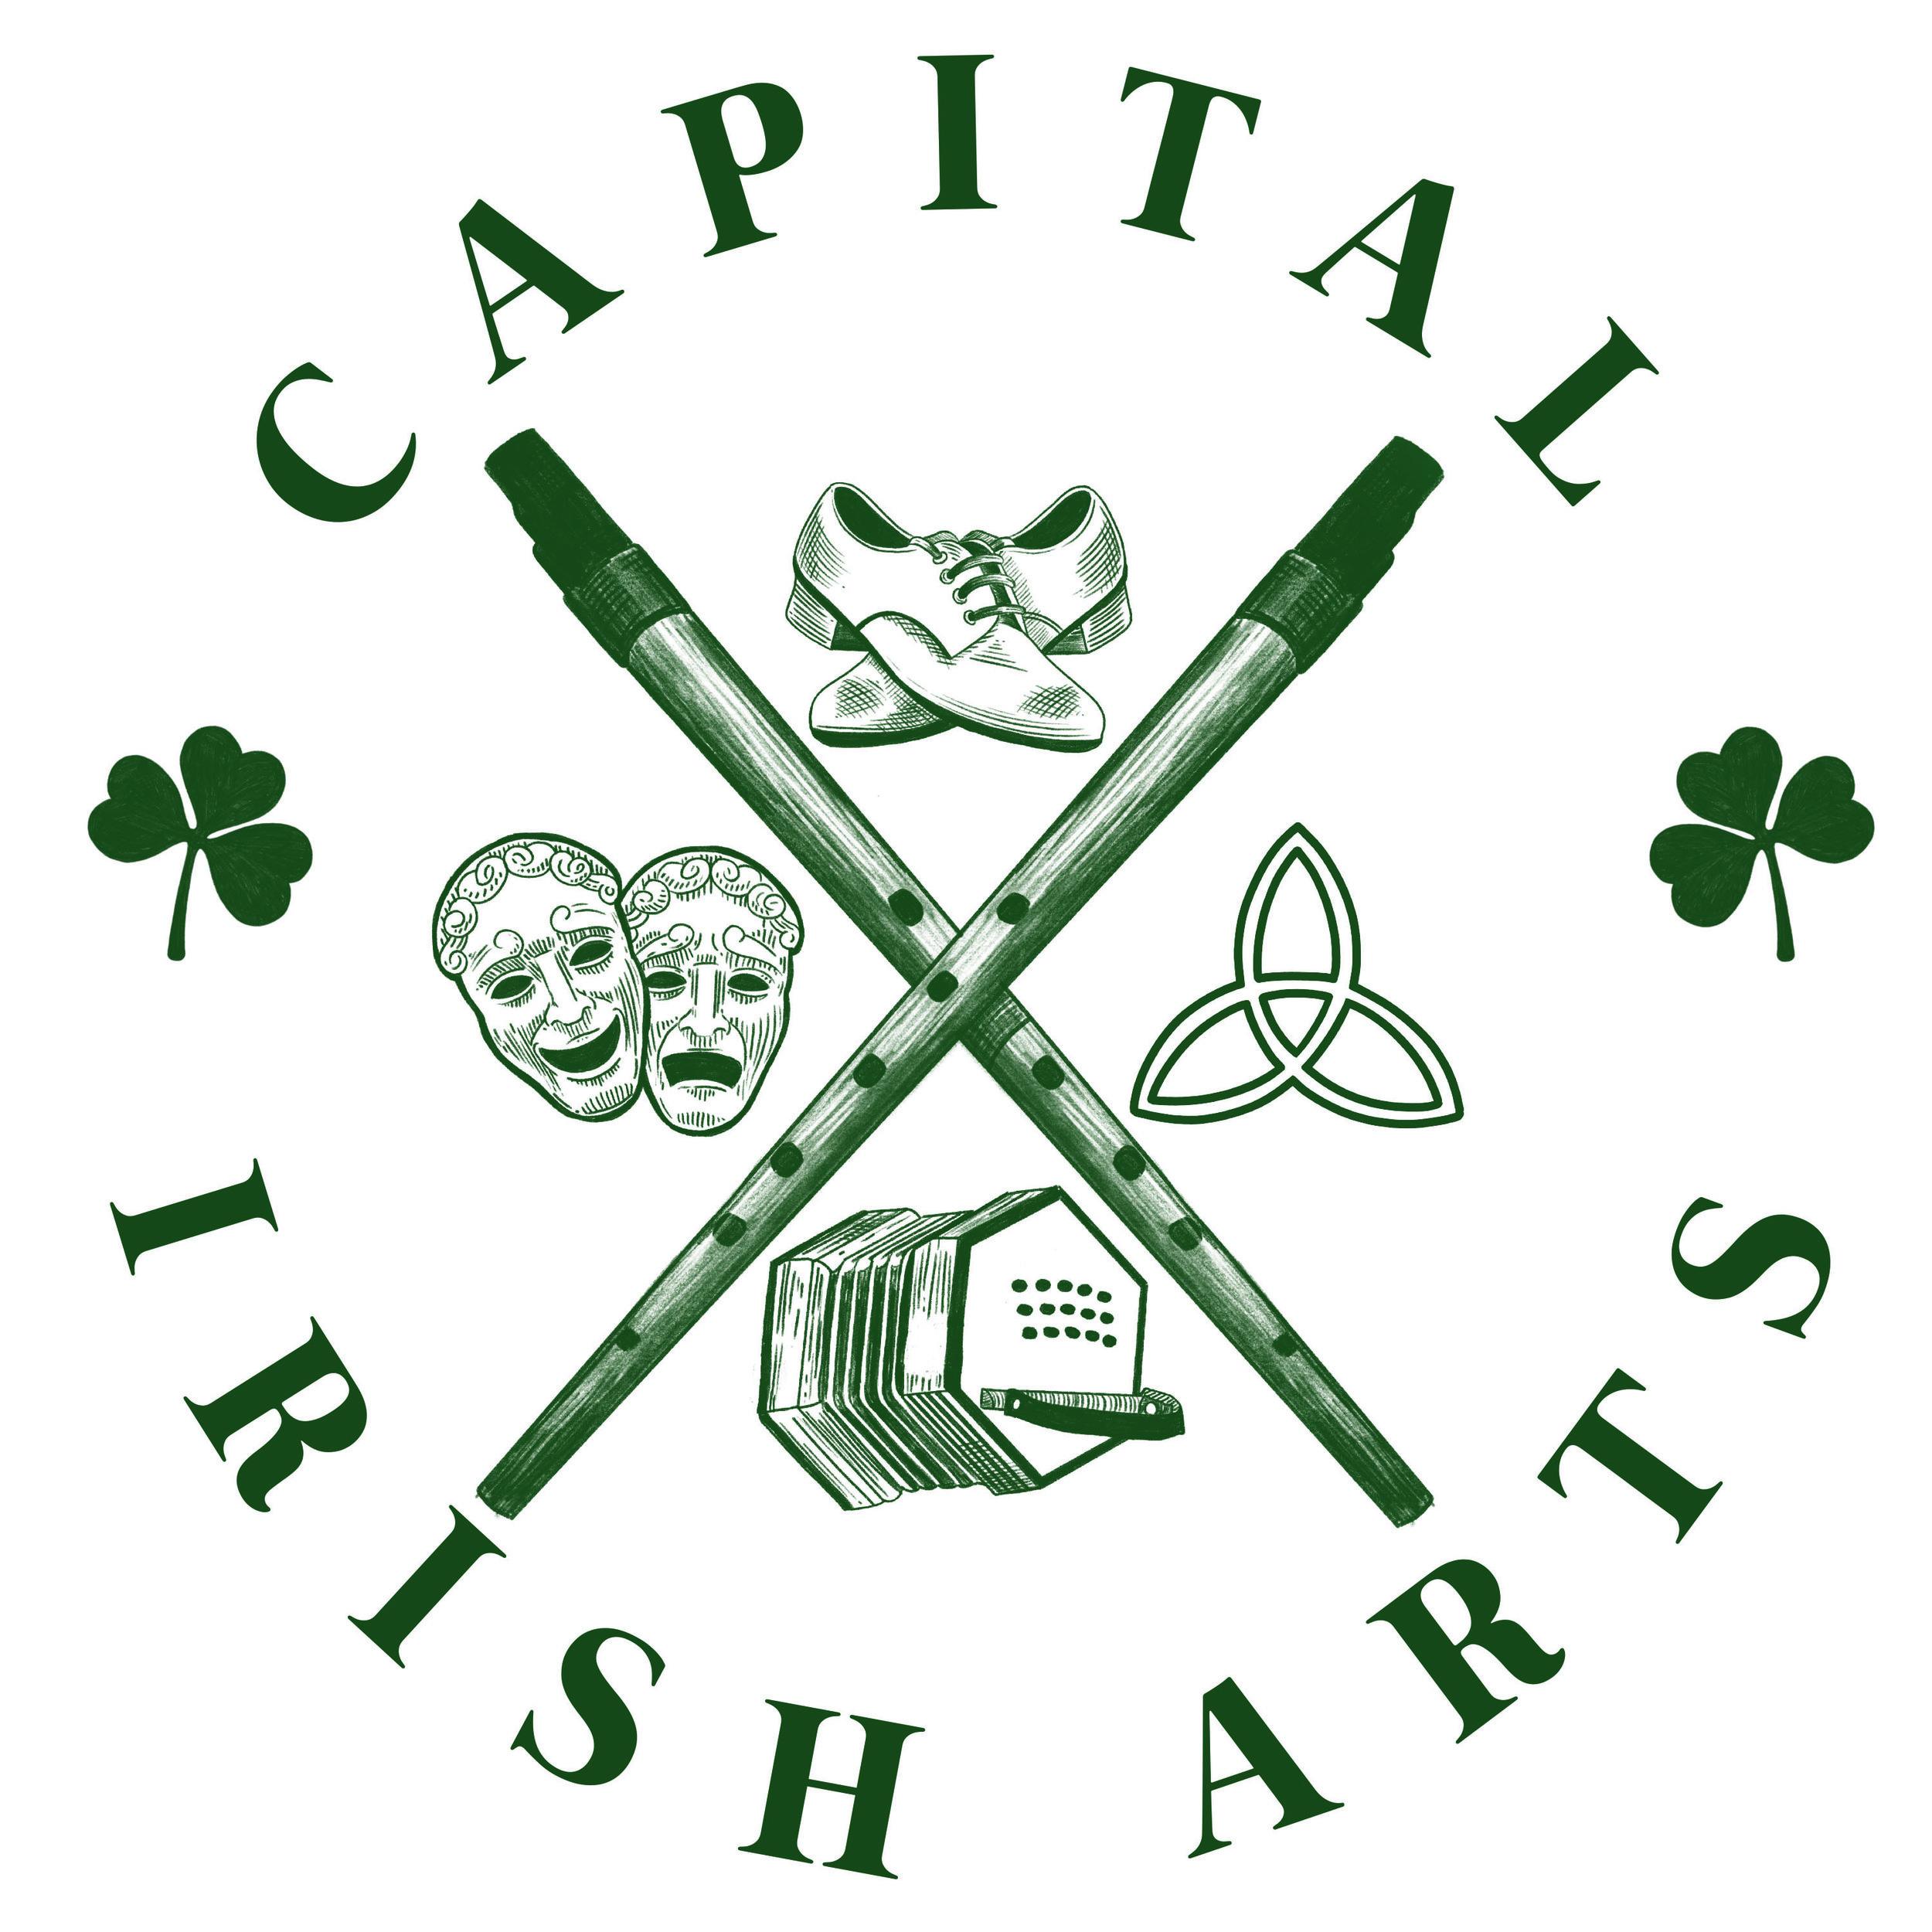 capitalirishartsgreen.jpg